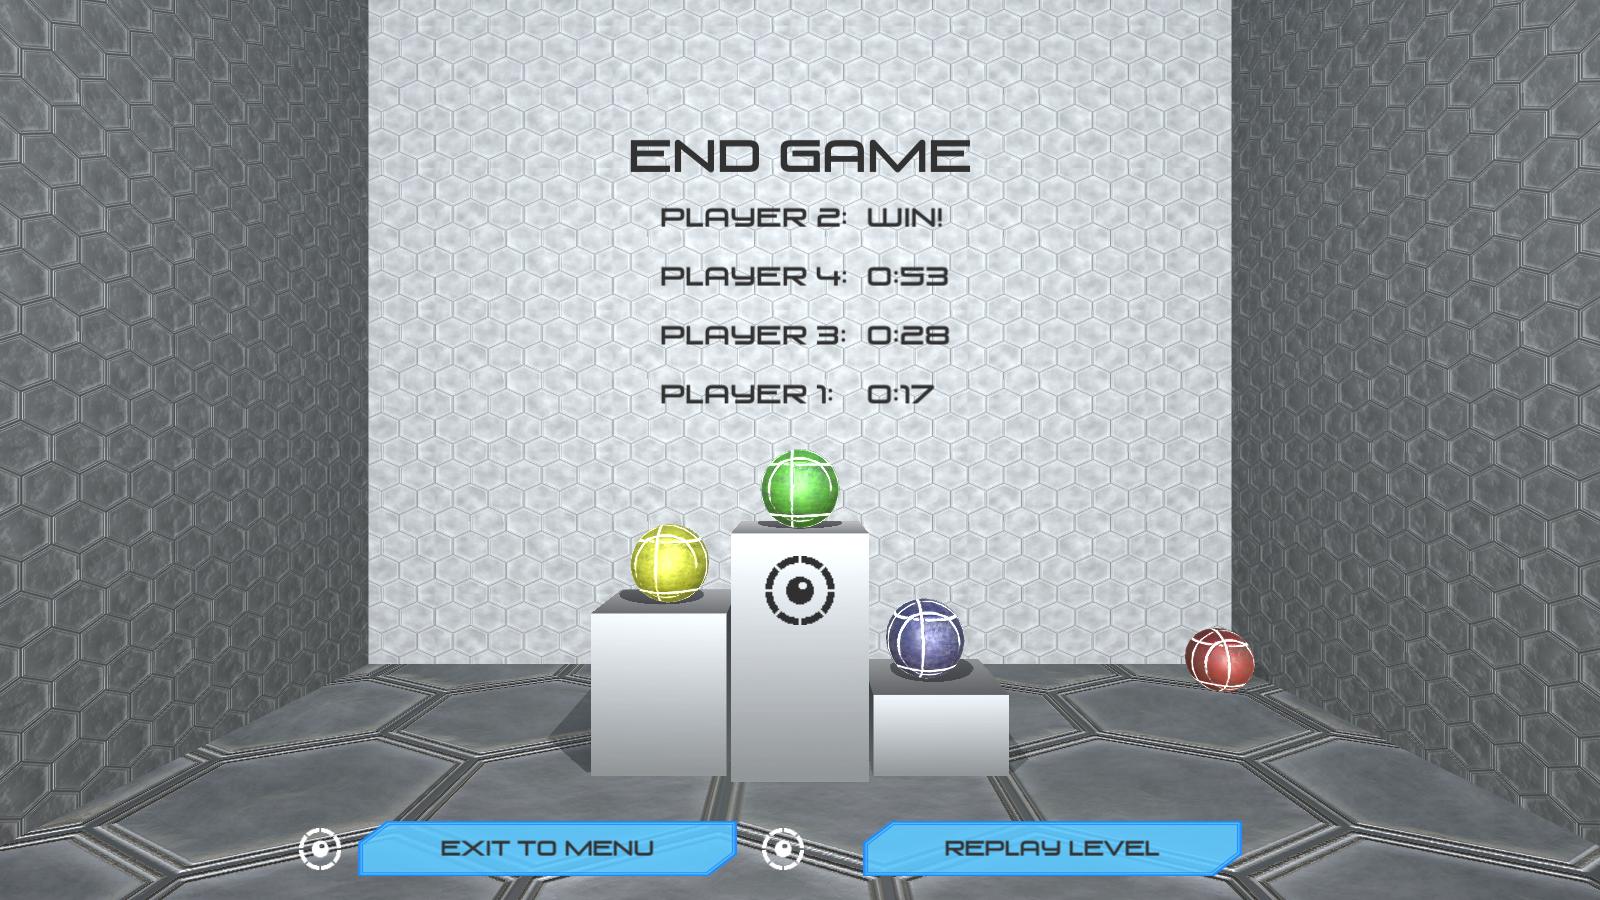 EndGameScreen.png